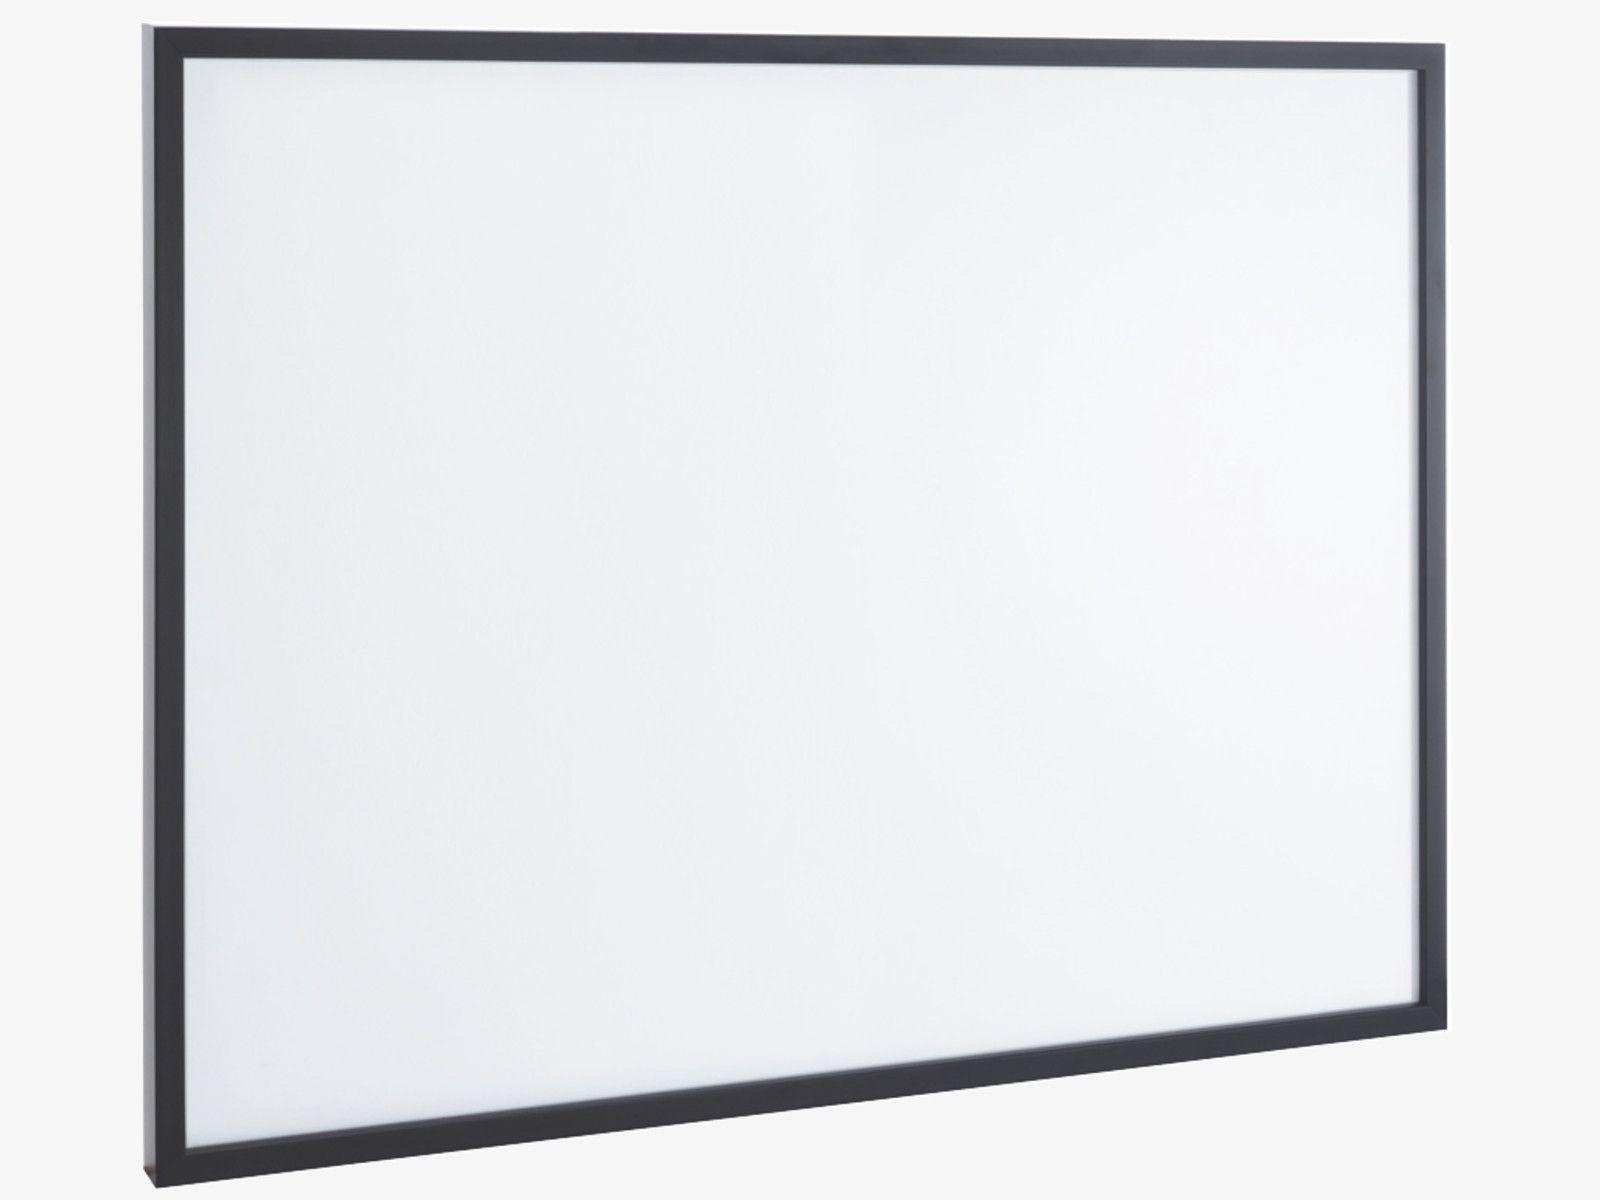 Image of Habitat Aluminus 60x80cm Wall Frame - White.